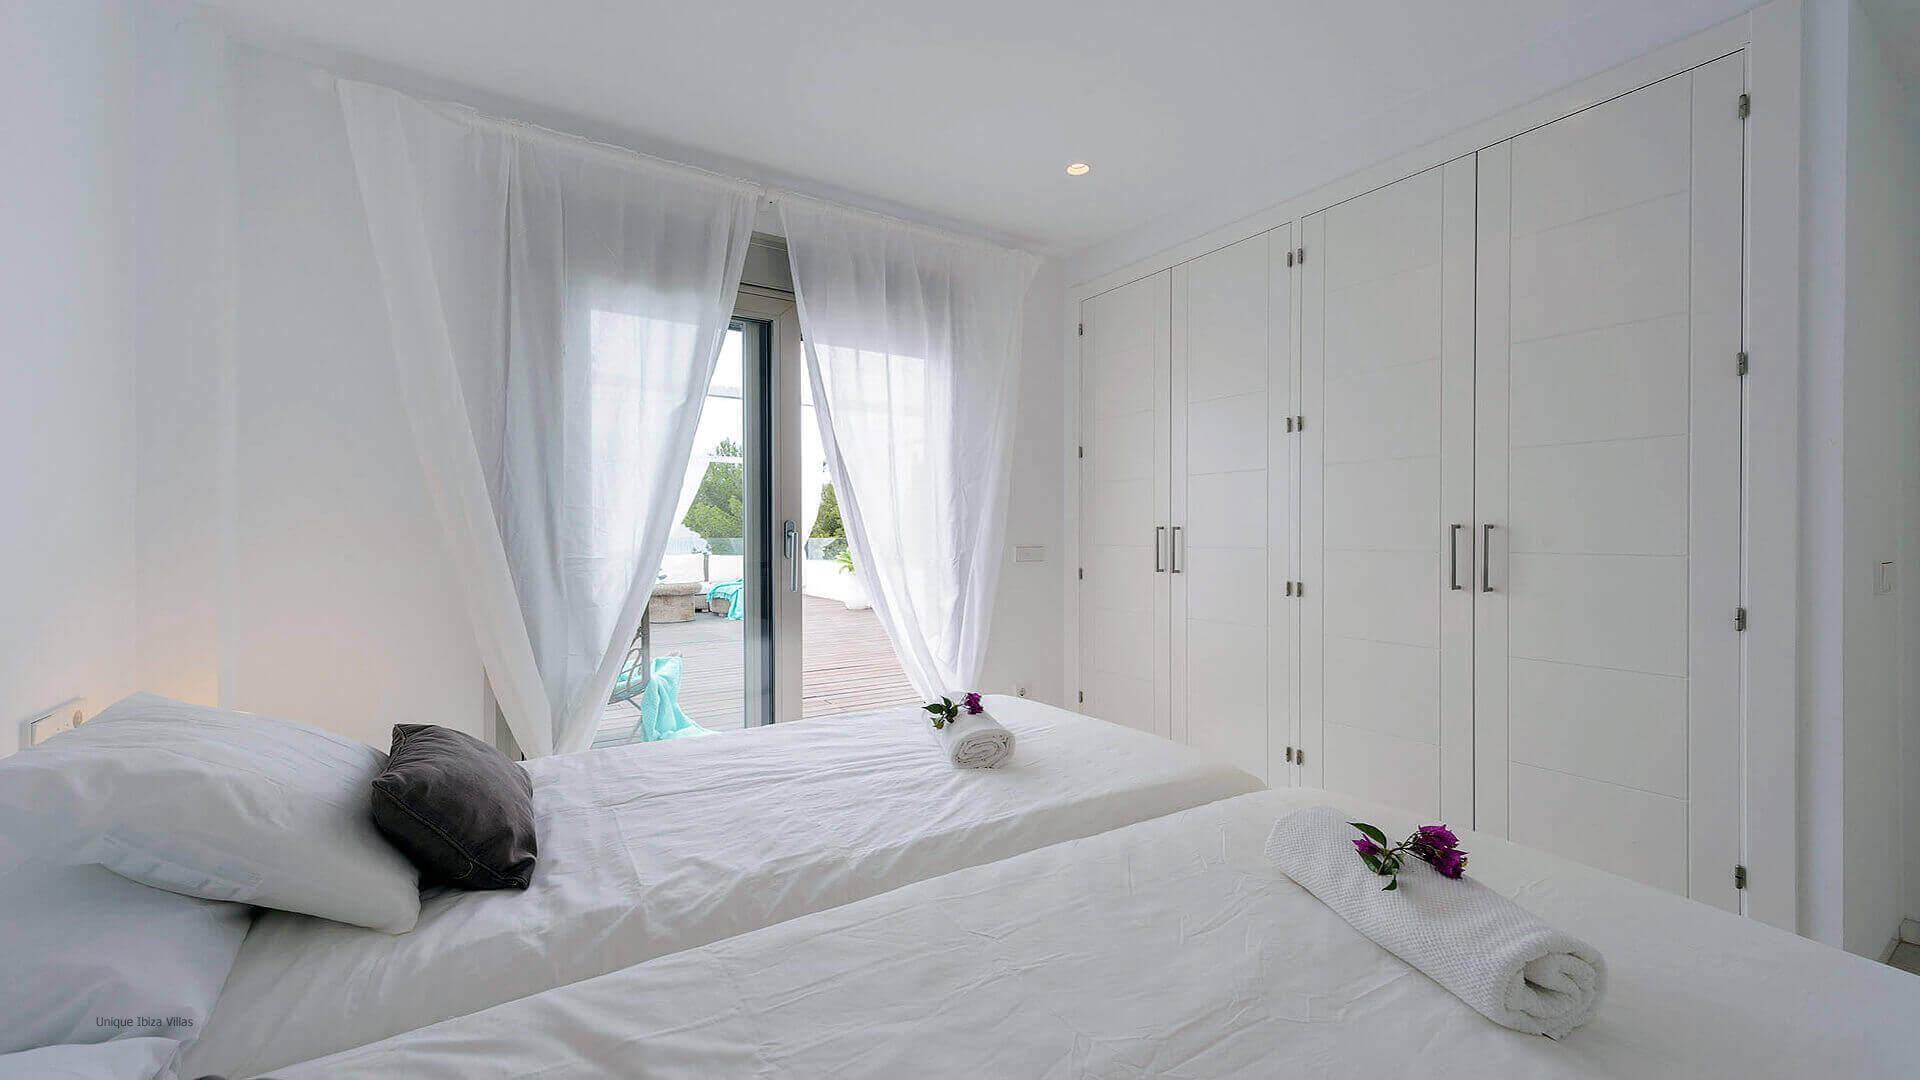 Villa Montecristo Ibiza 34 Bedroom 2